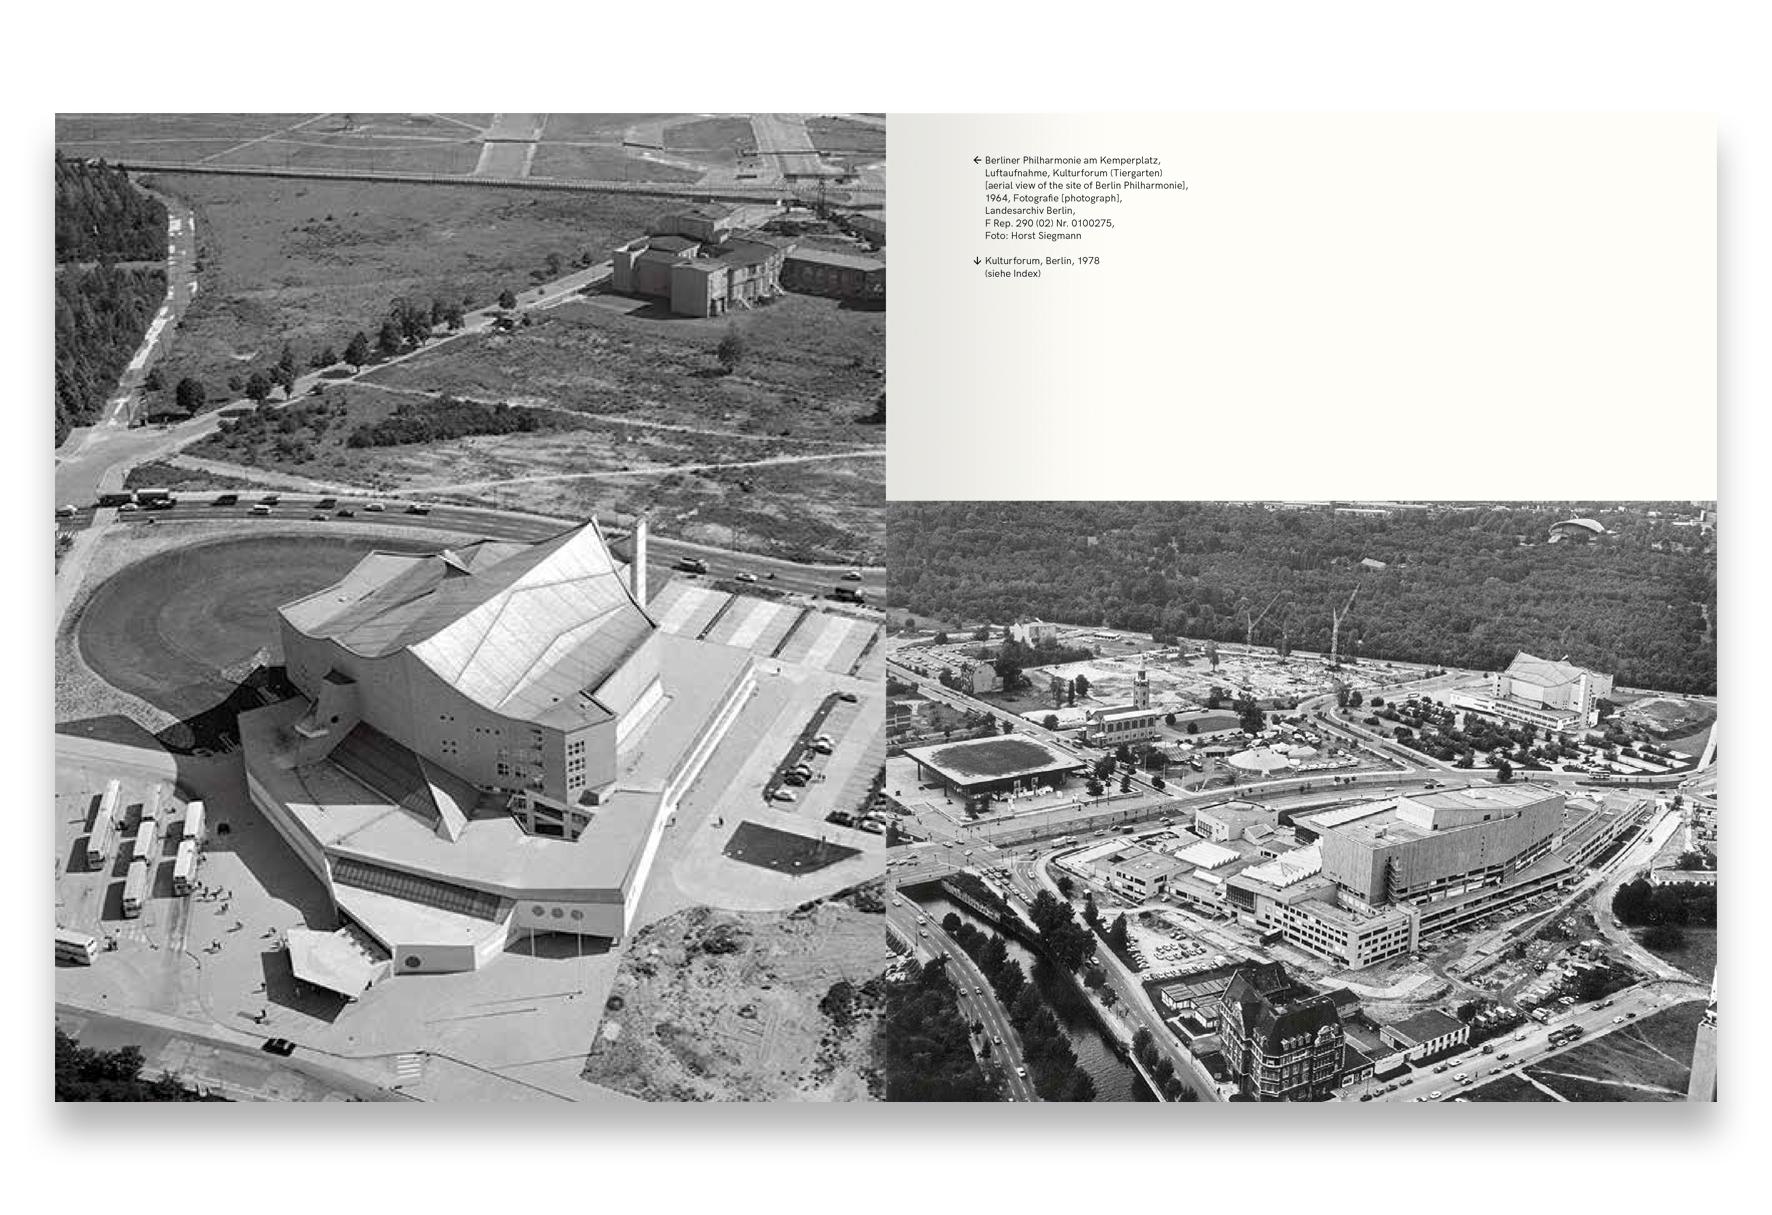 SPREADS_Gehry-Scharoun_05.jpg